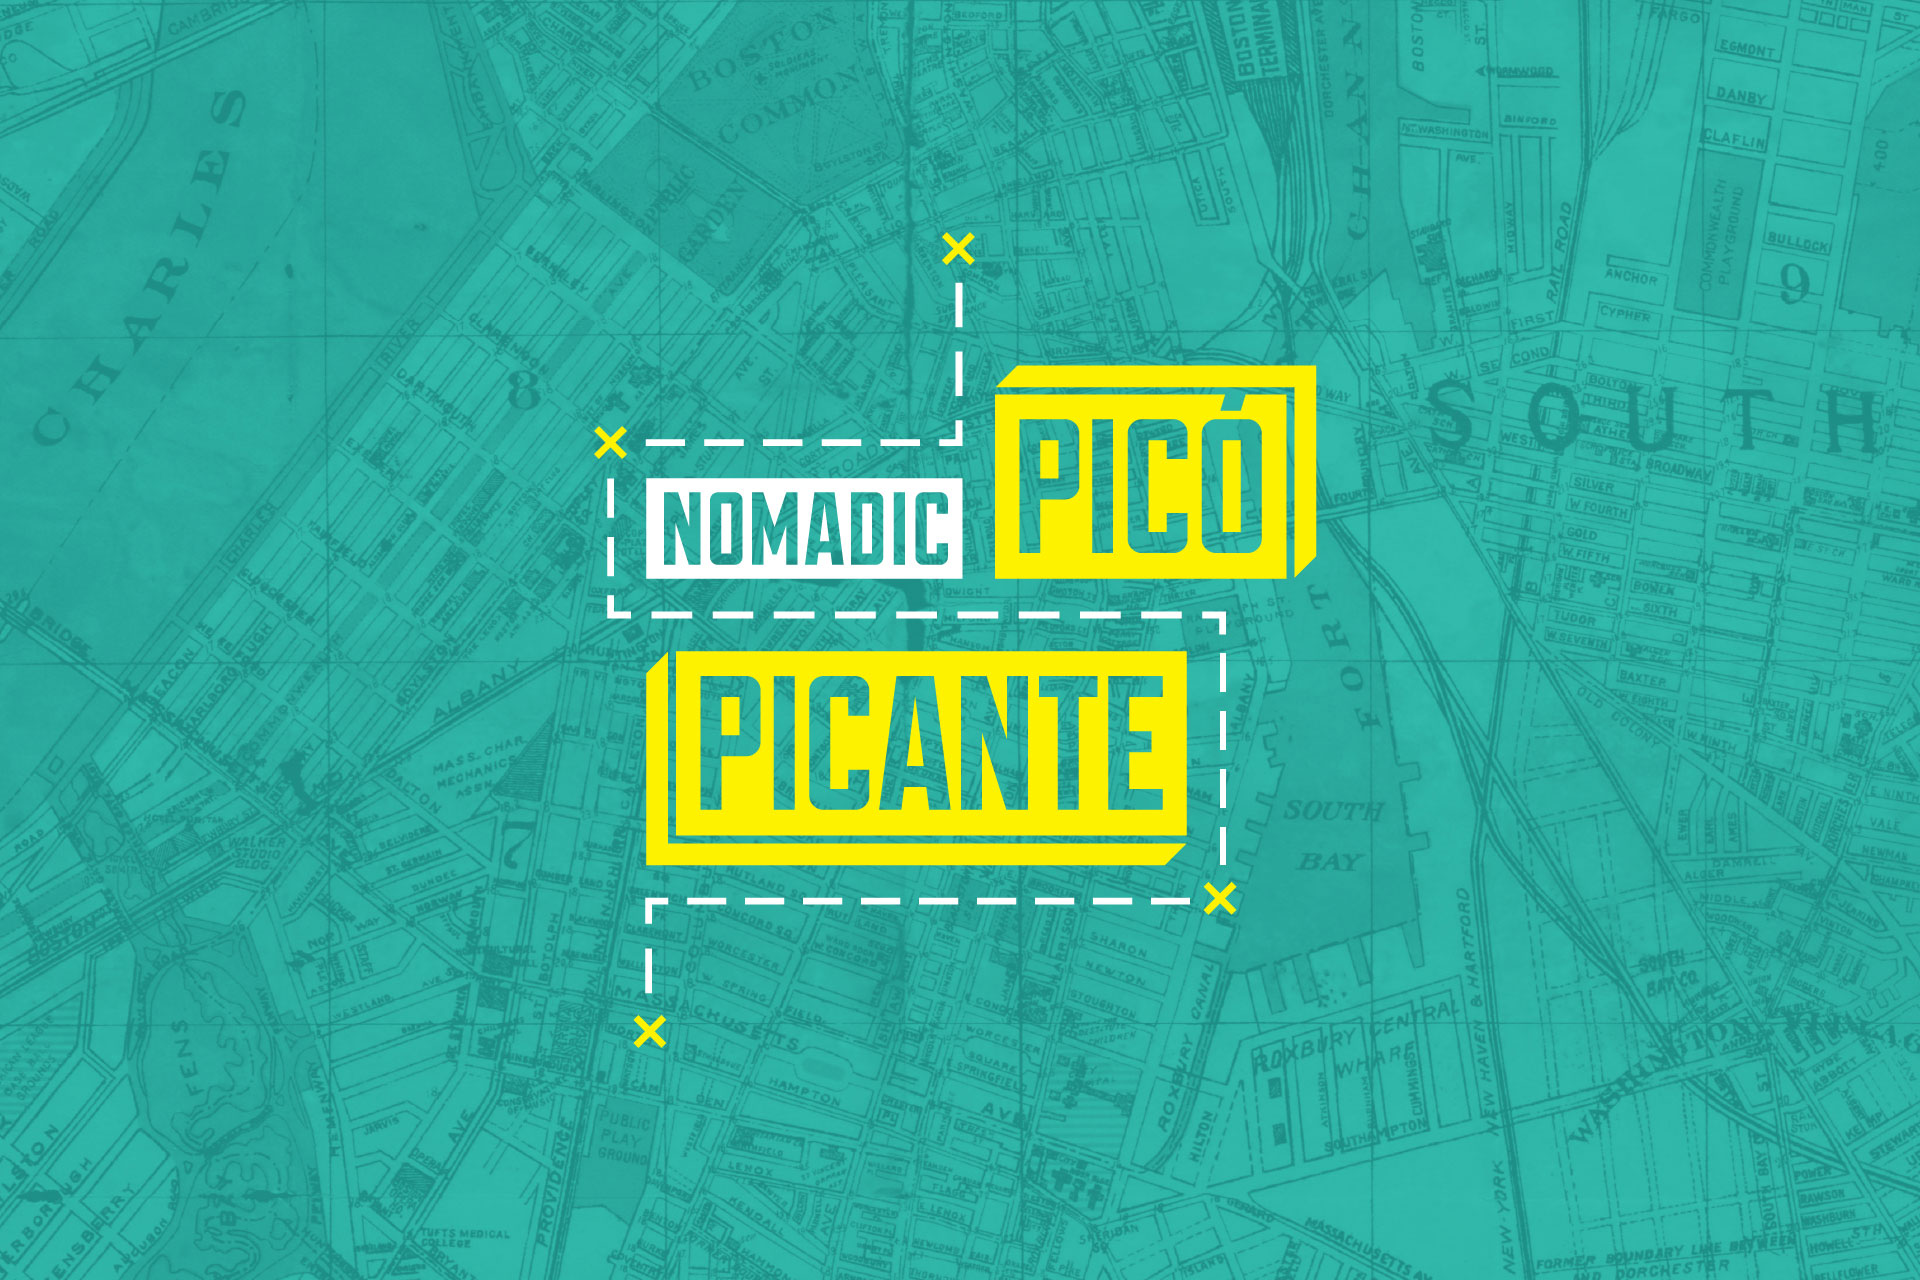 studio-malagon-nomadic-pico-picante